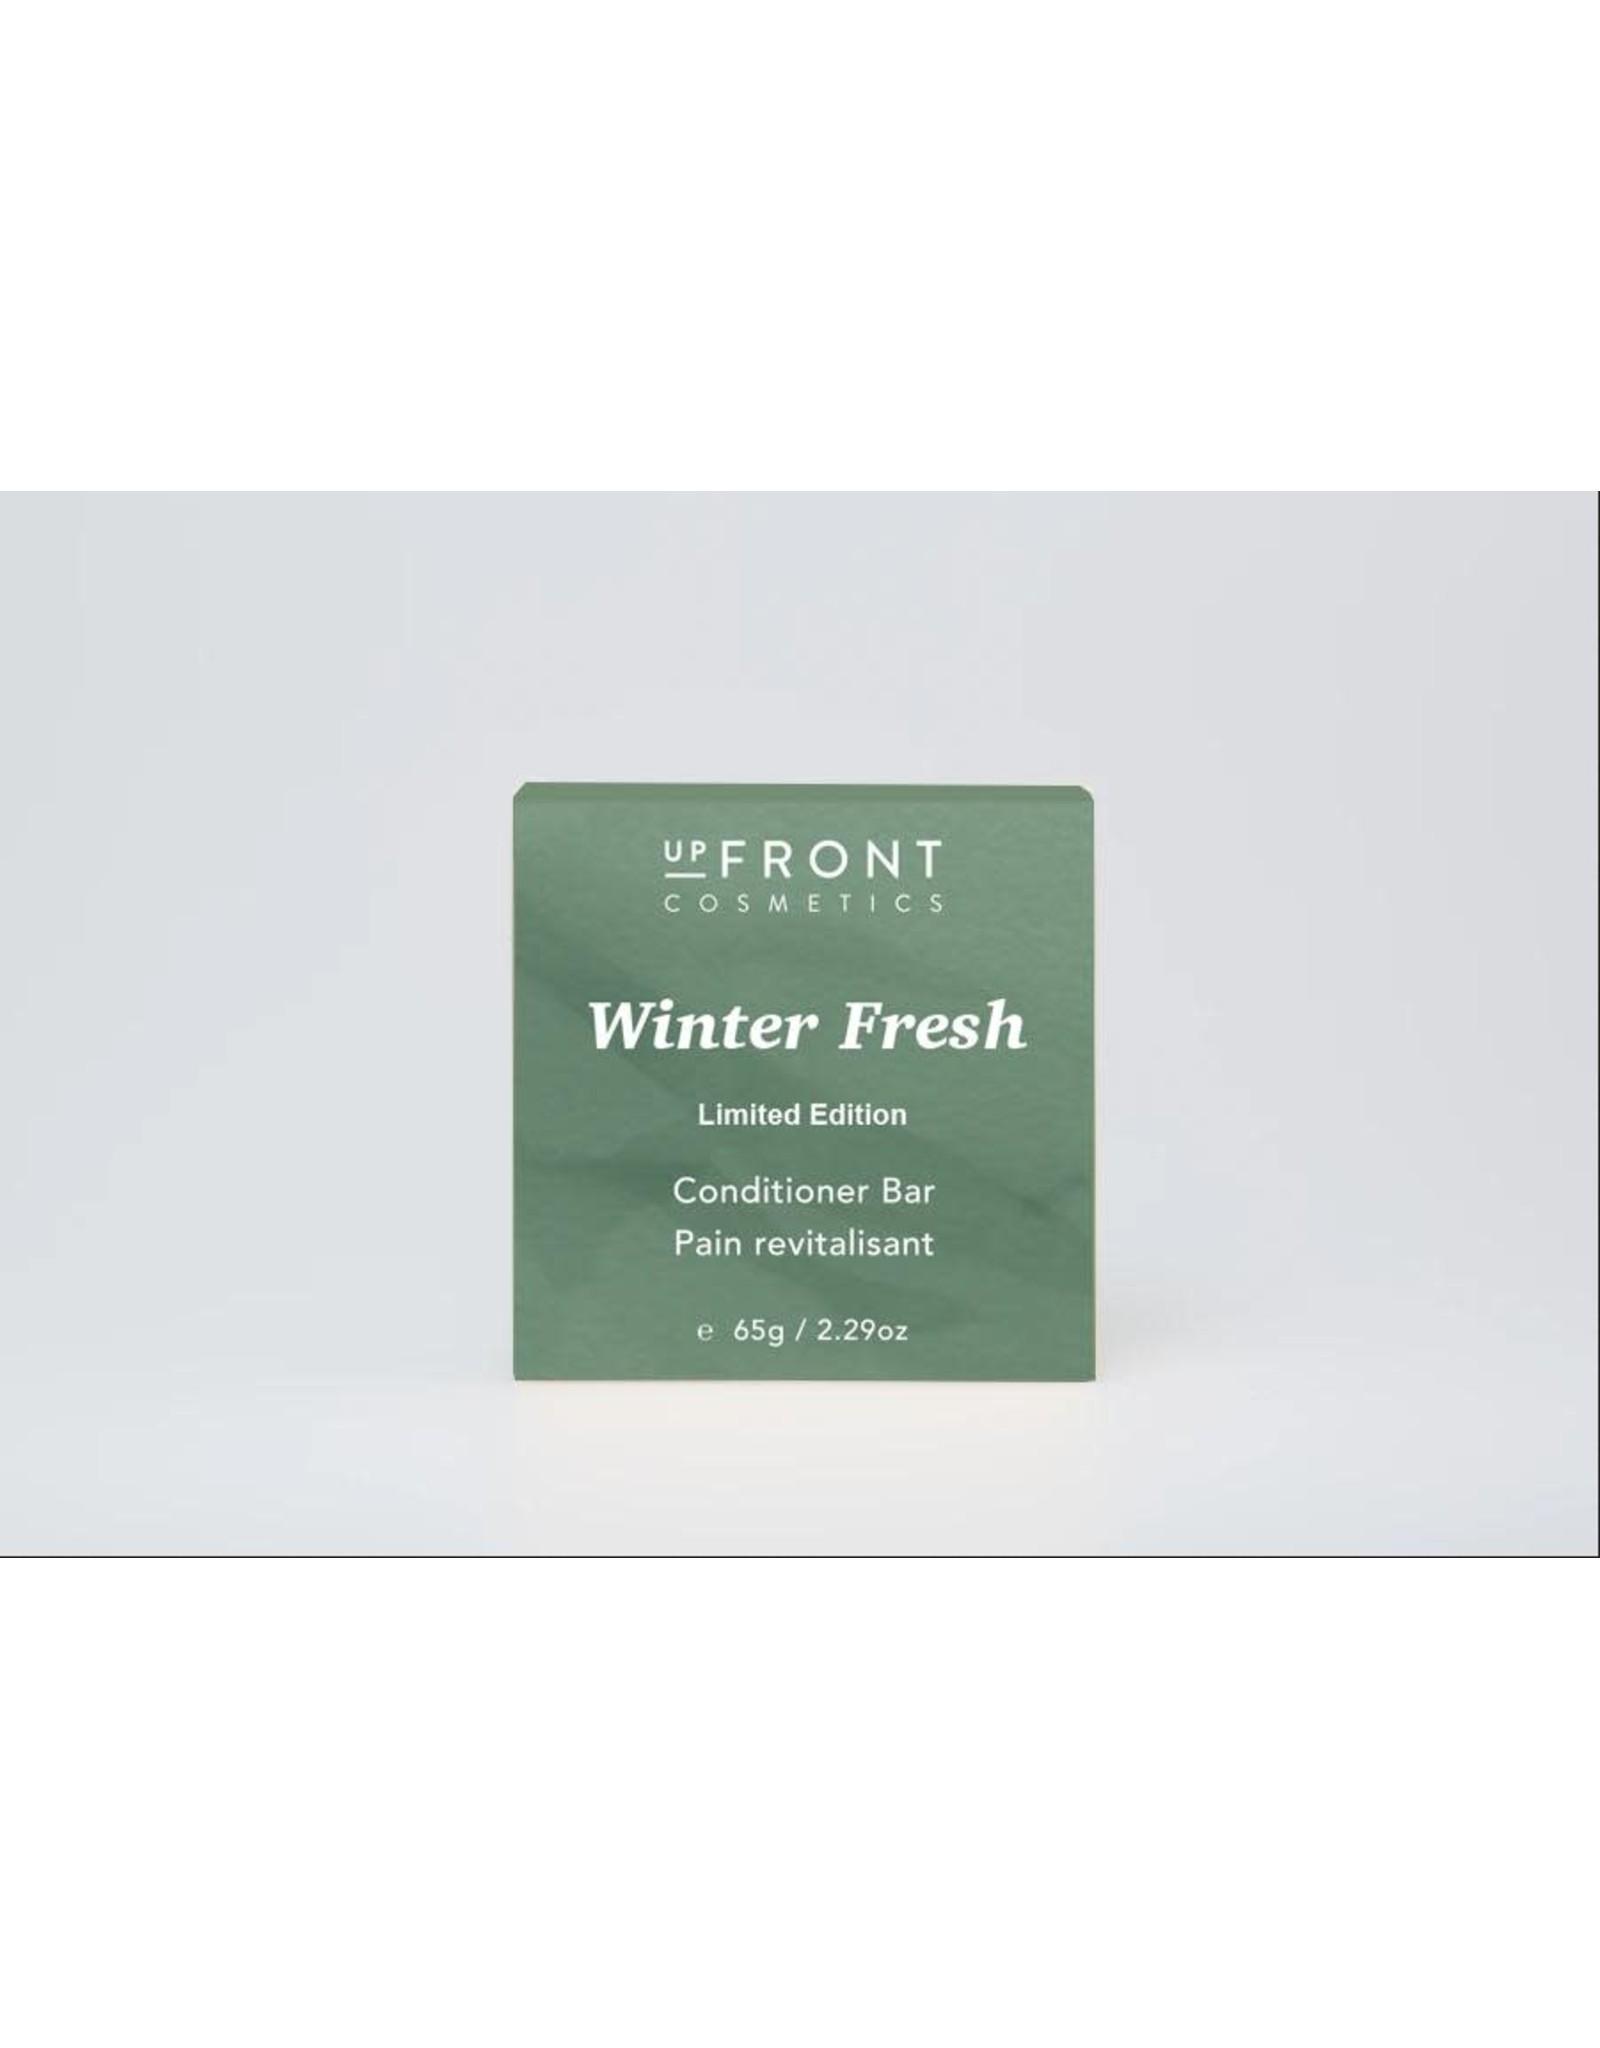 Upfront Cosmetics Limted Edition/Seasonal Conditioner Bar by Upfront Cosmetics